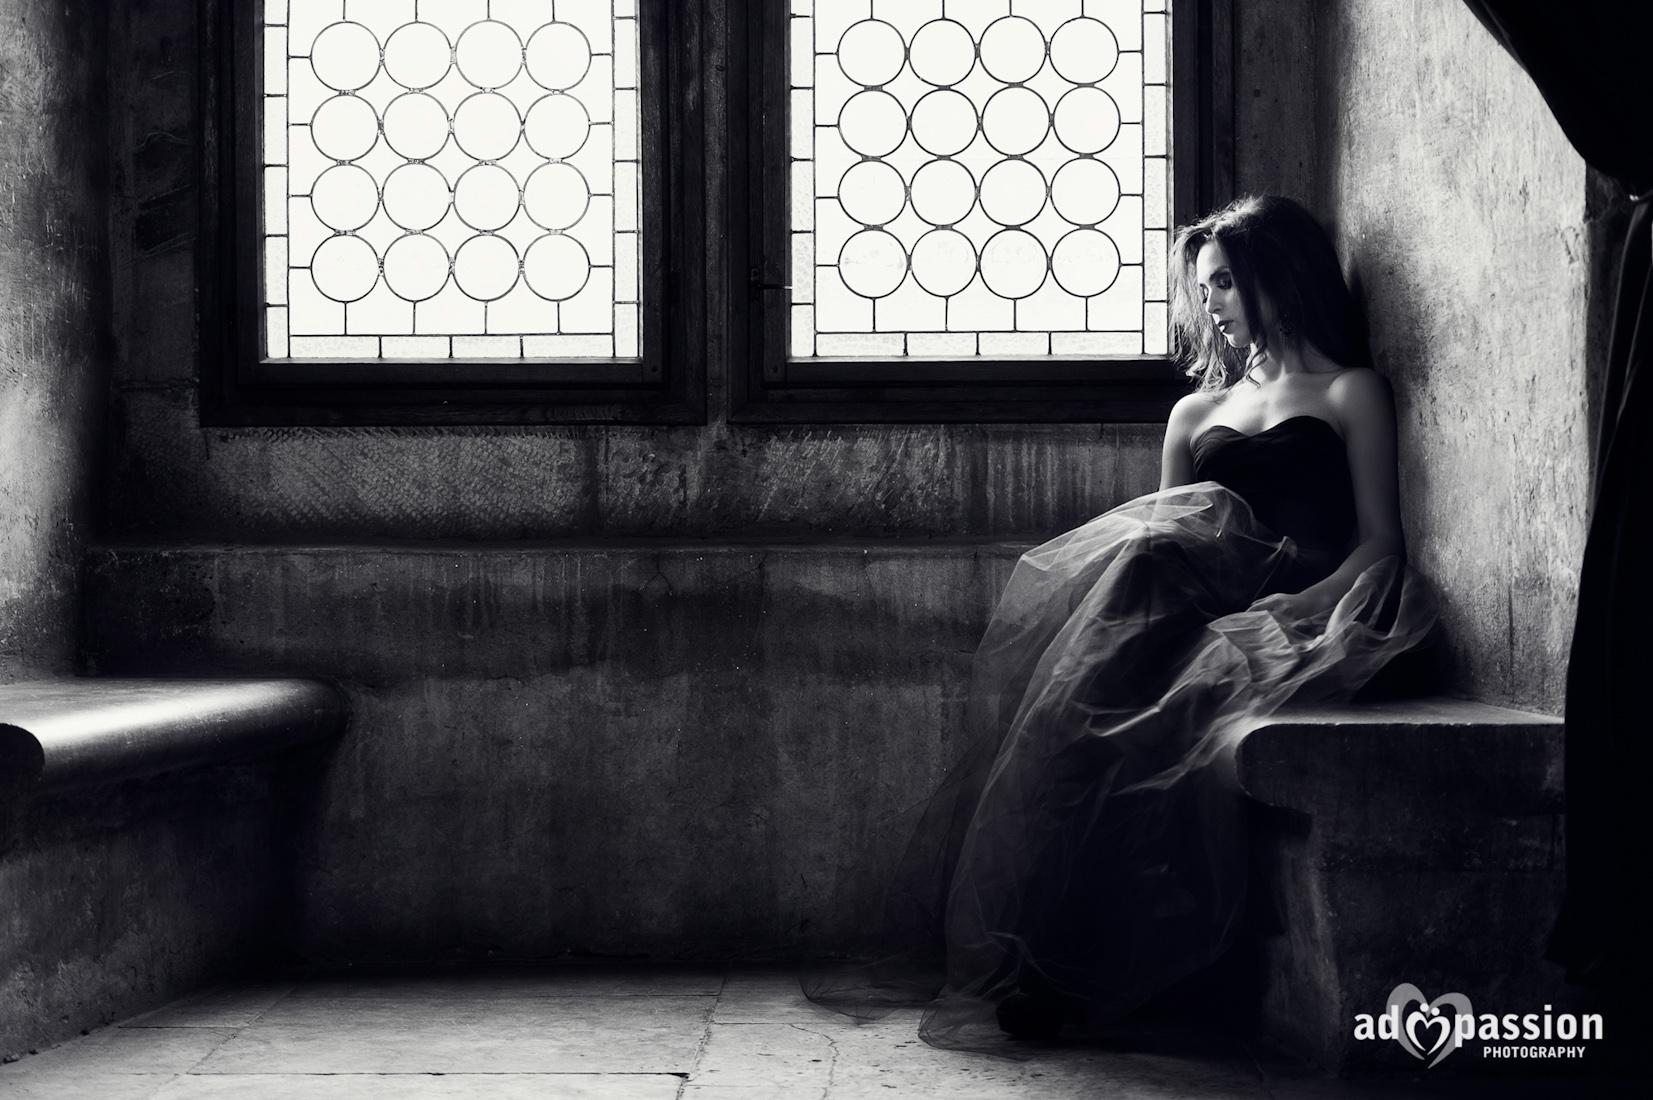 AD Passion Photography | alexandra_castelul_huniazilor_022 | Adelin, Dida, fotograf profesionist, fotograf de nunta, fotografie de nunta, fotograf Timisoara, fotograf Craiova, fotograf Bucuresti, fotograf Arad, nunta Timisoara, nunta Arad, nunta Bucuresti, nunta Craiova